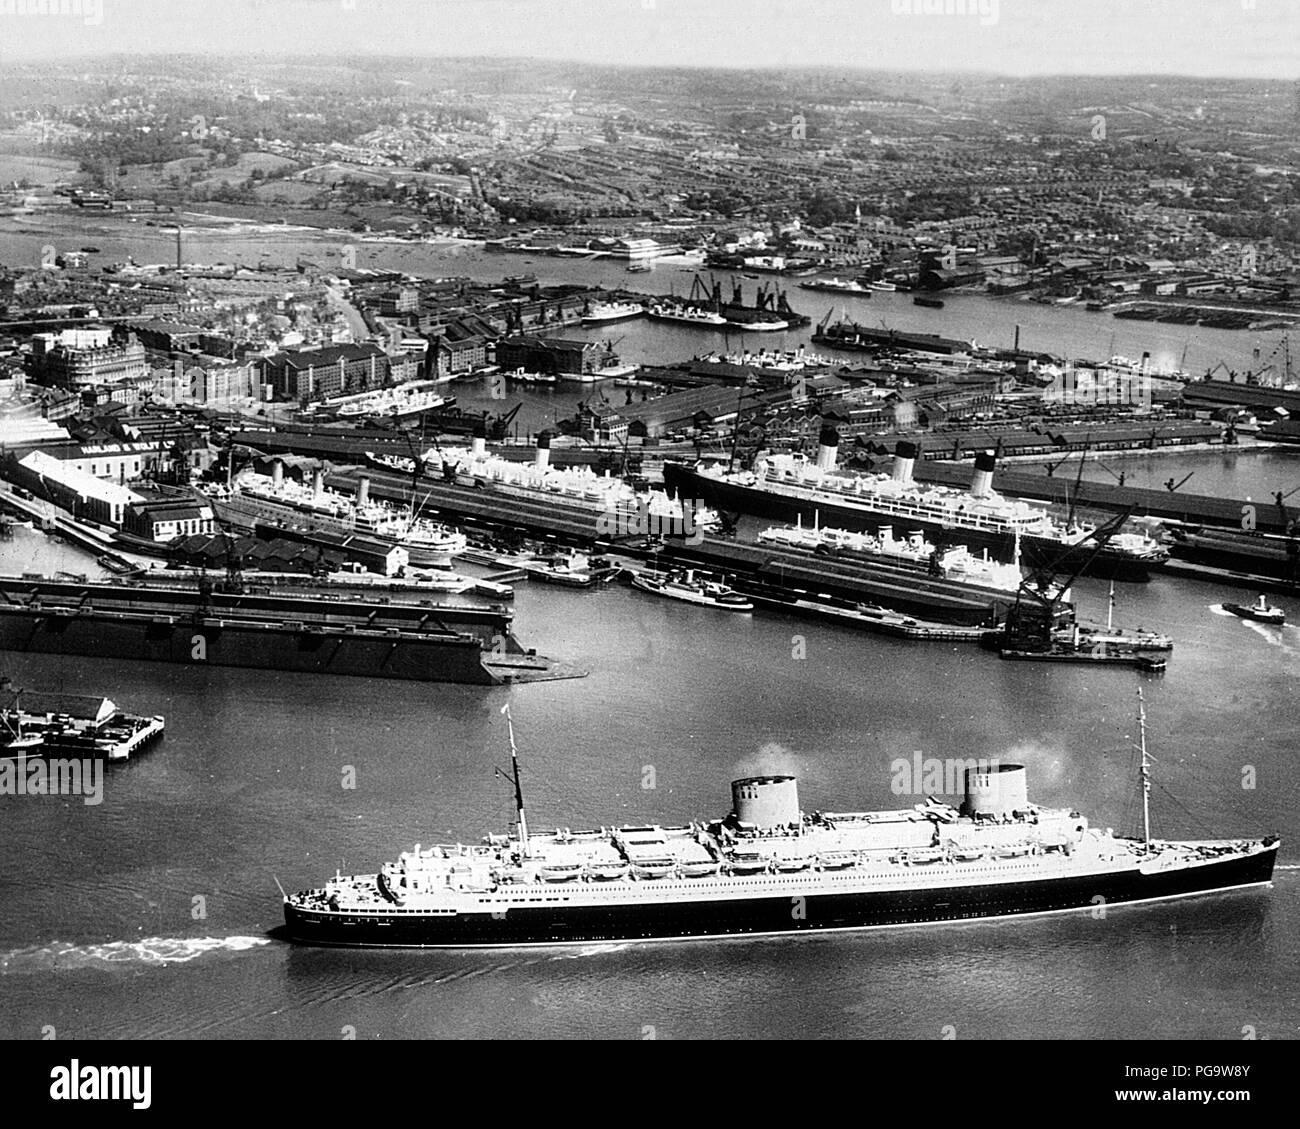 Southampton Docks, early 1900s - Stock Image